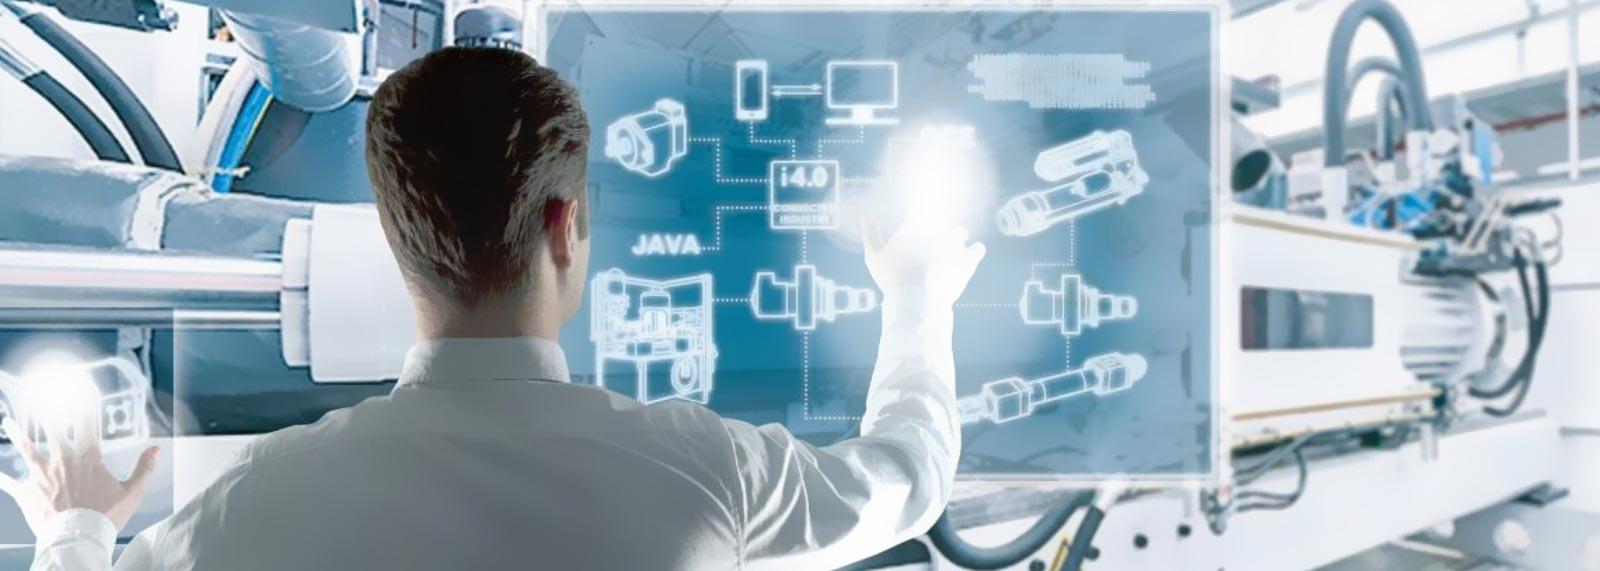 Progettazione | Gas.Net Group | INDUSTRIA 4.0